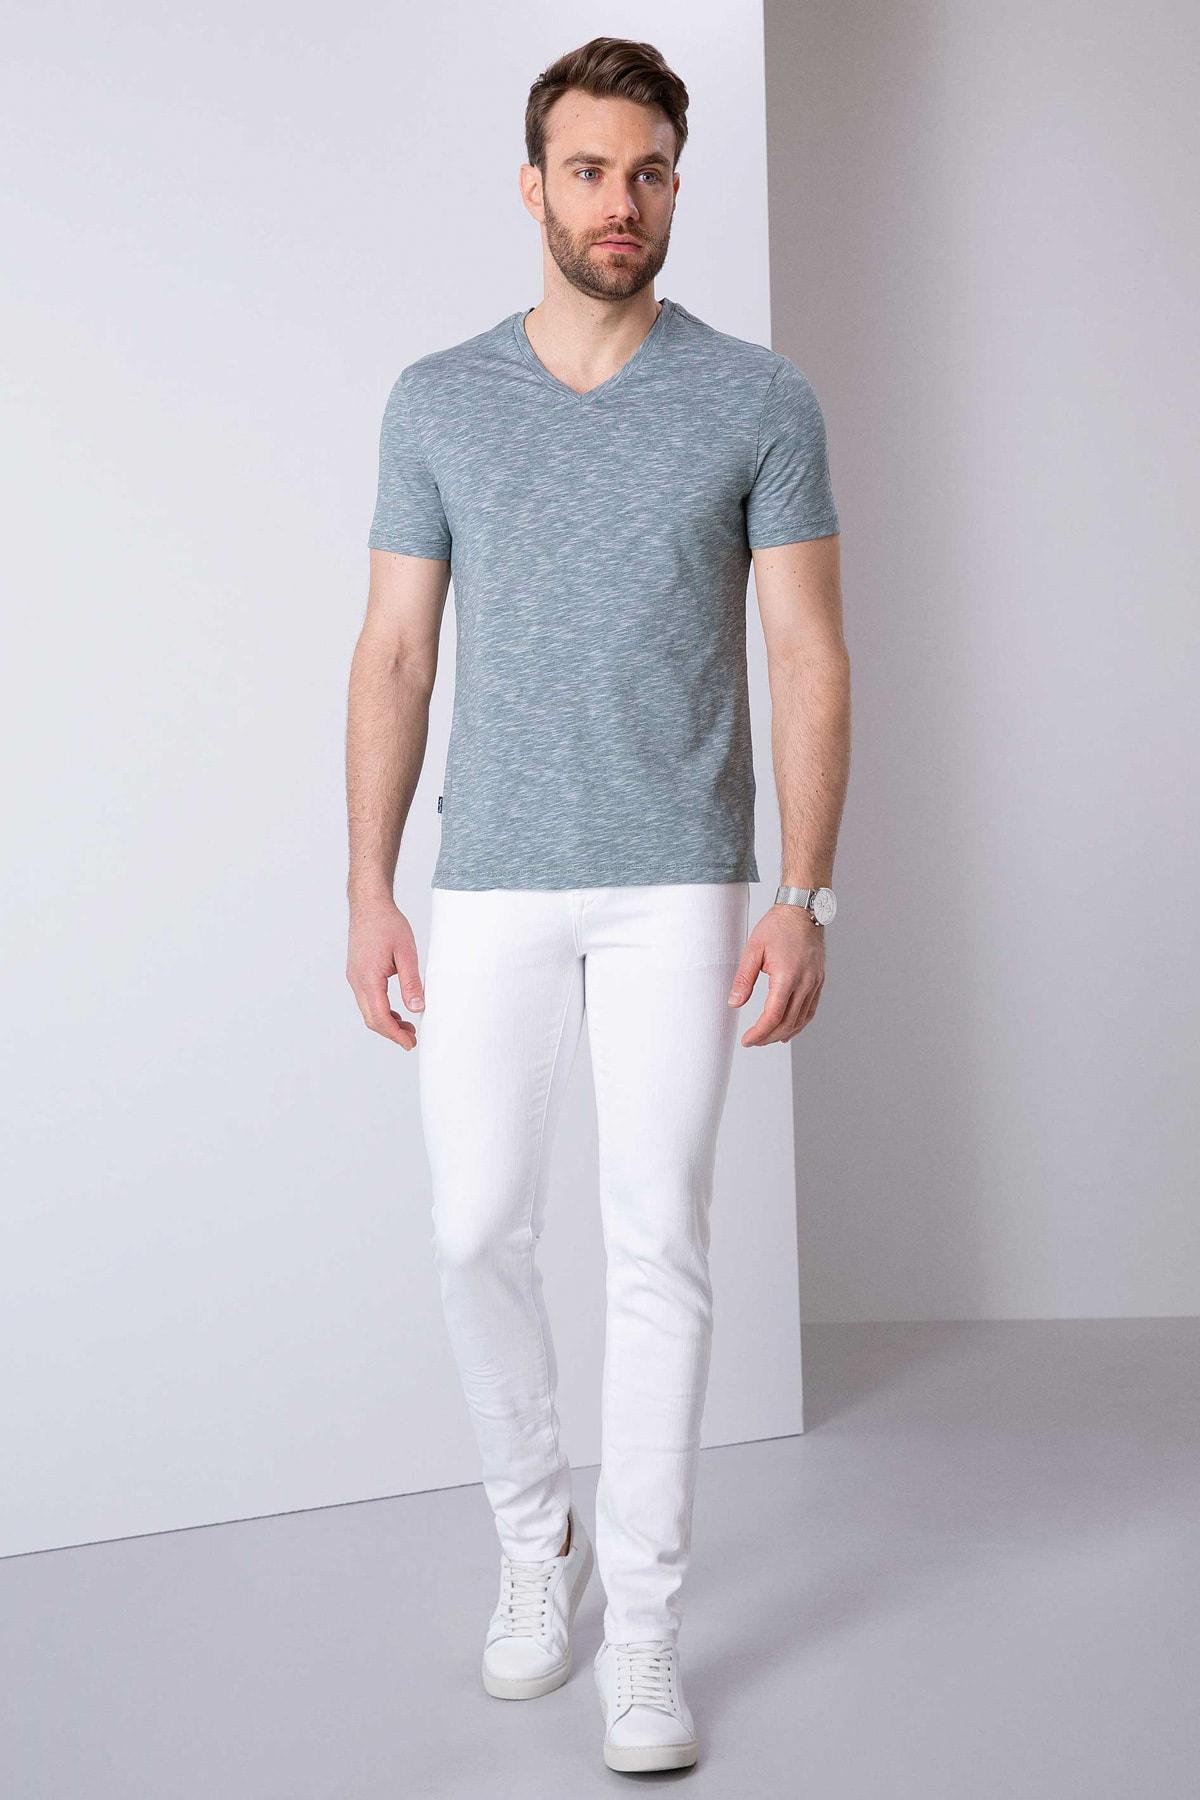 Pierre Cardin Erkek Koyu Yeşil Slim Fit T-Shirt 2